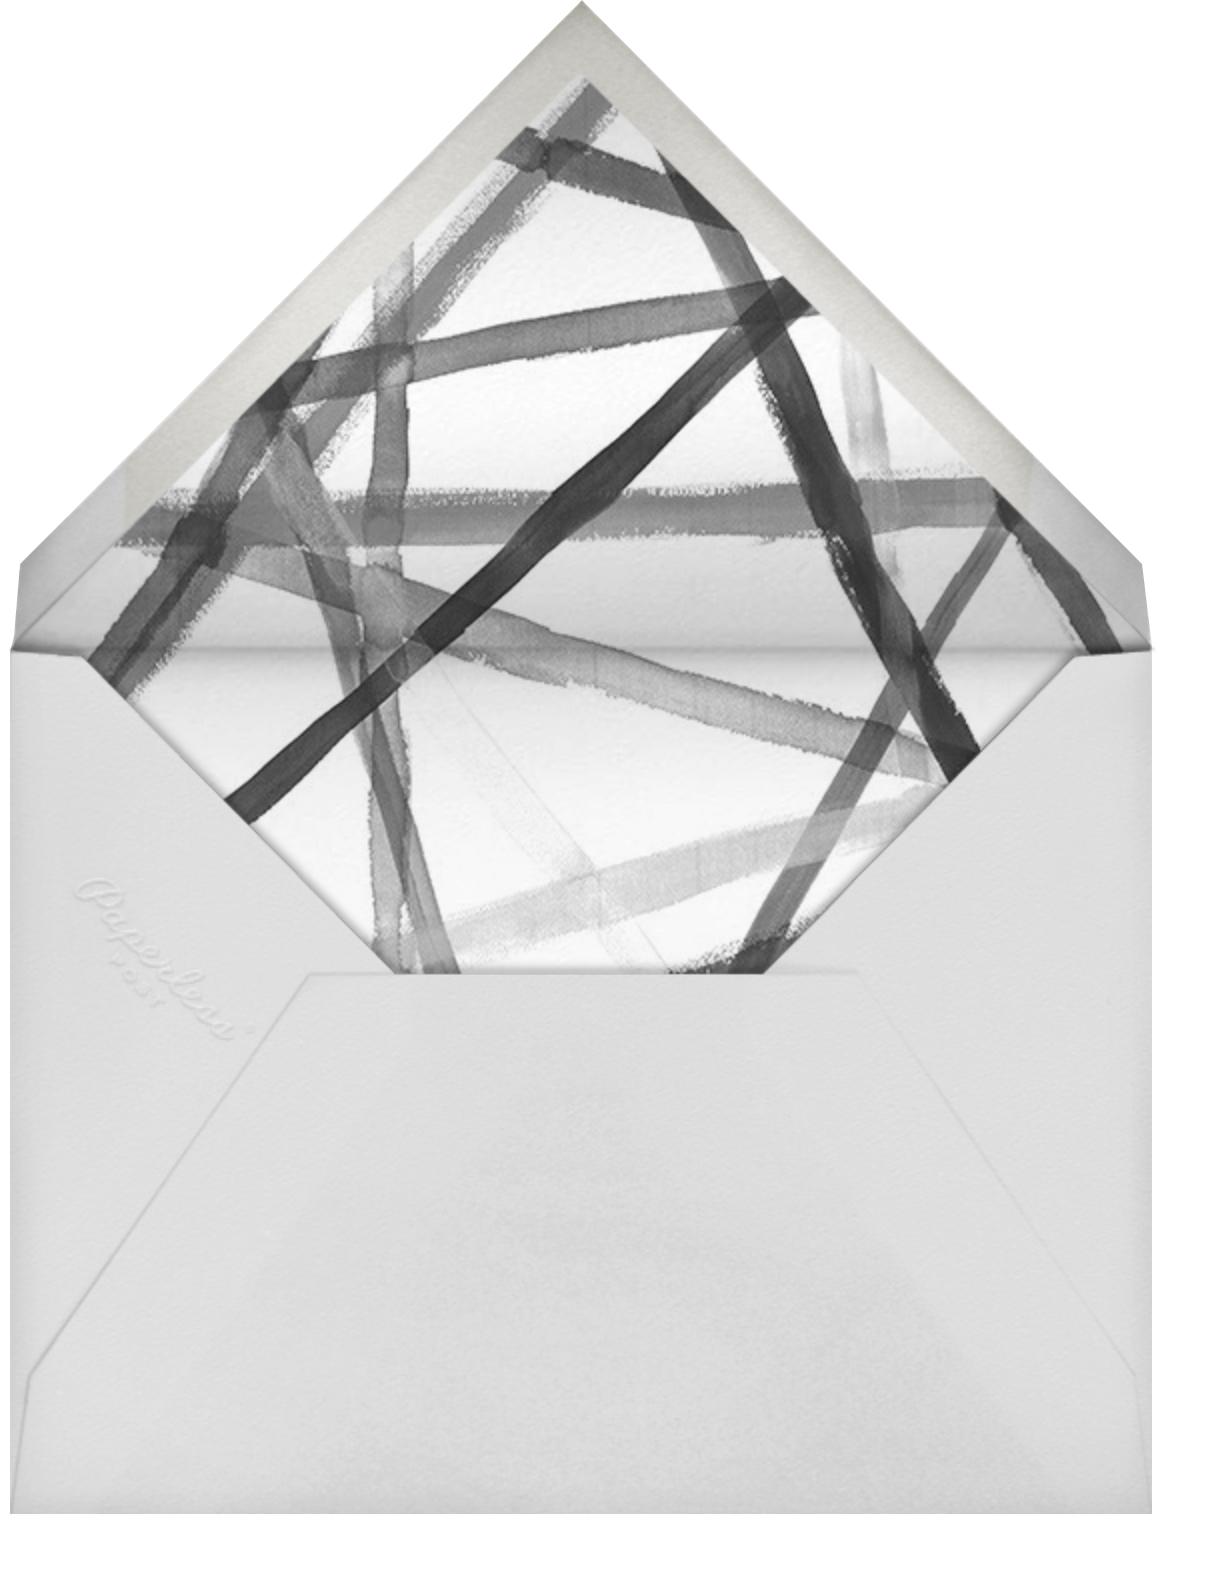 Channels Photo - White/Gold - Kelly Wearstler - Envelope